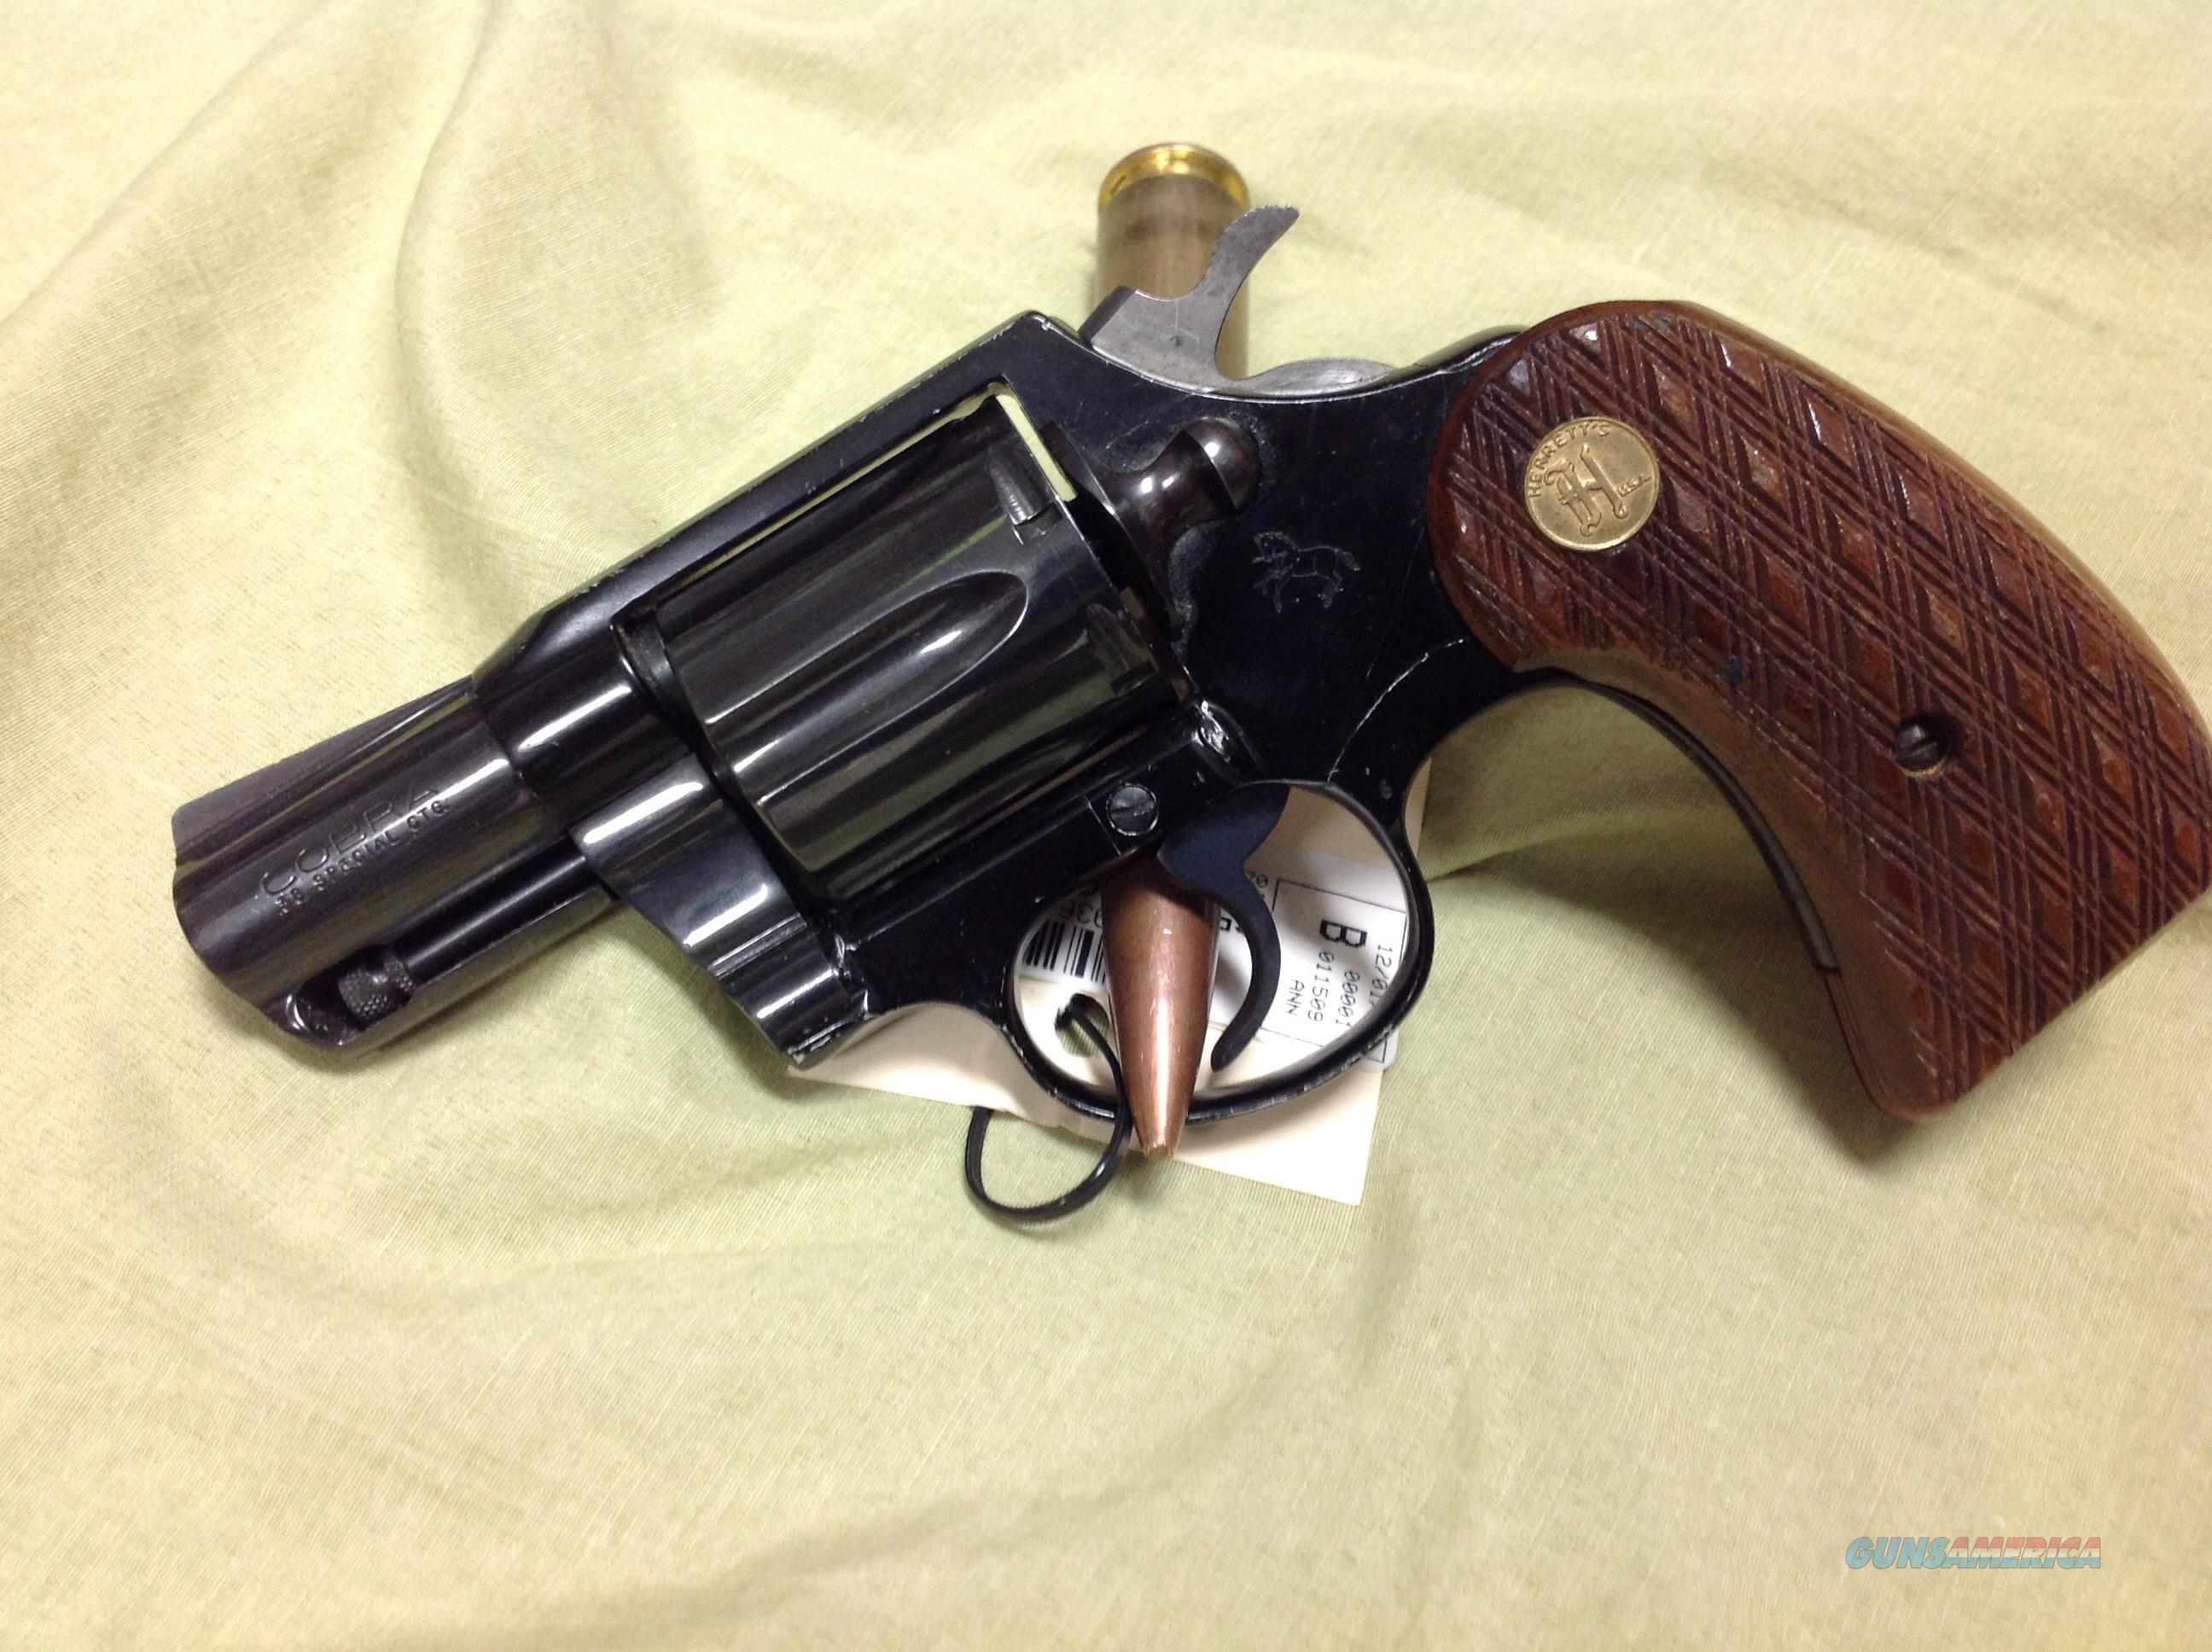 HQ Colt Cobra 38 Special Revolver Wallpapers | File 559.19Kb